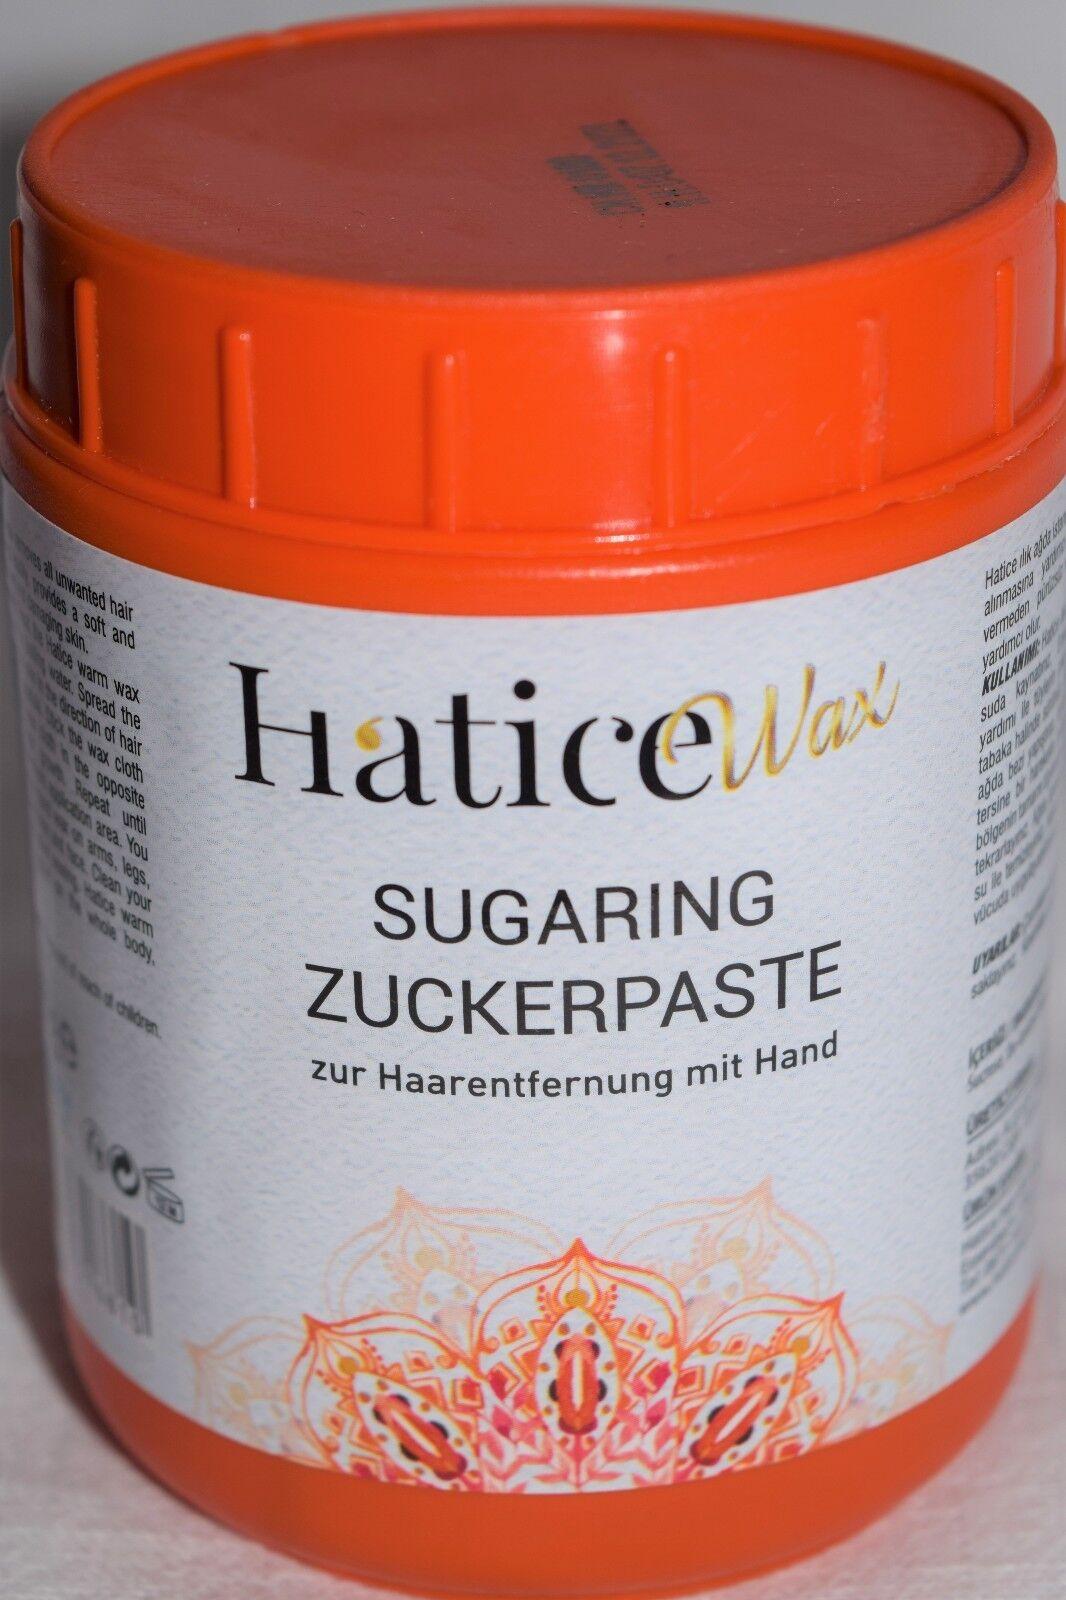 1750g SUGARING Enthaarung ZUCKERPASTE Sugar Waxing Sir Agda Warm-/Heisswachs Wax